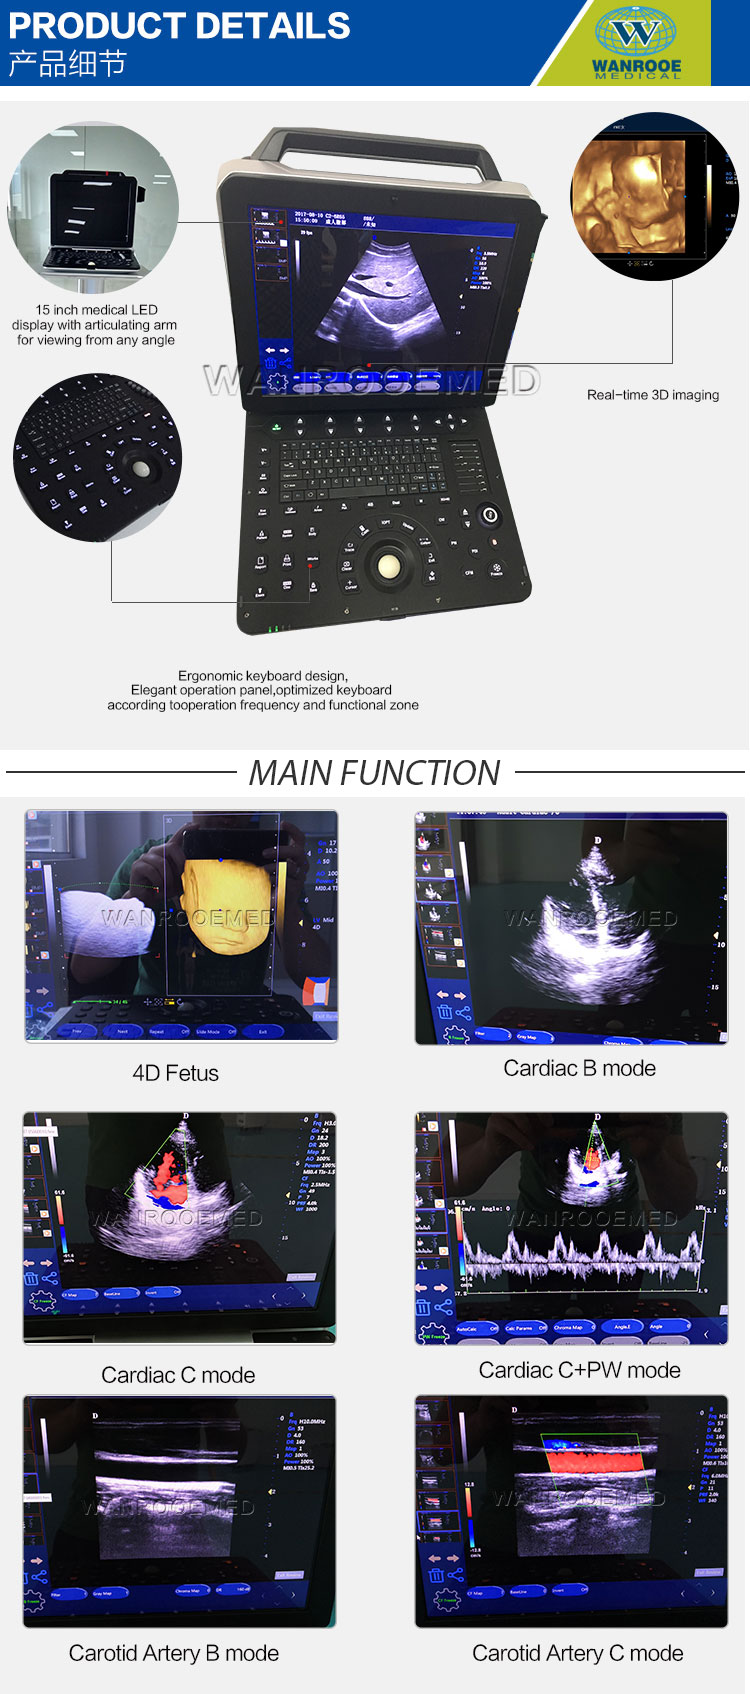 4D Ultrasound, Portable Ultrasound Machine, Color Ultrasound Machine, Color Ultrasound Scanner, Pregnancy Ultrasound Machine